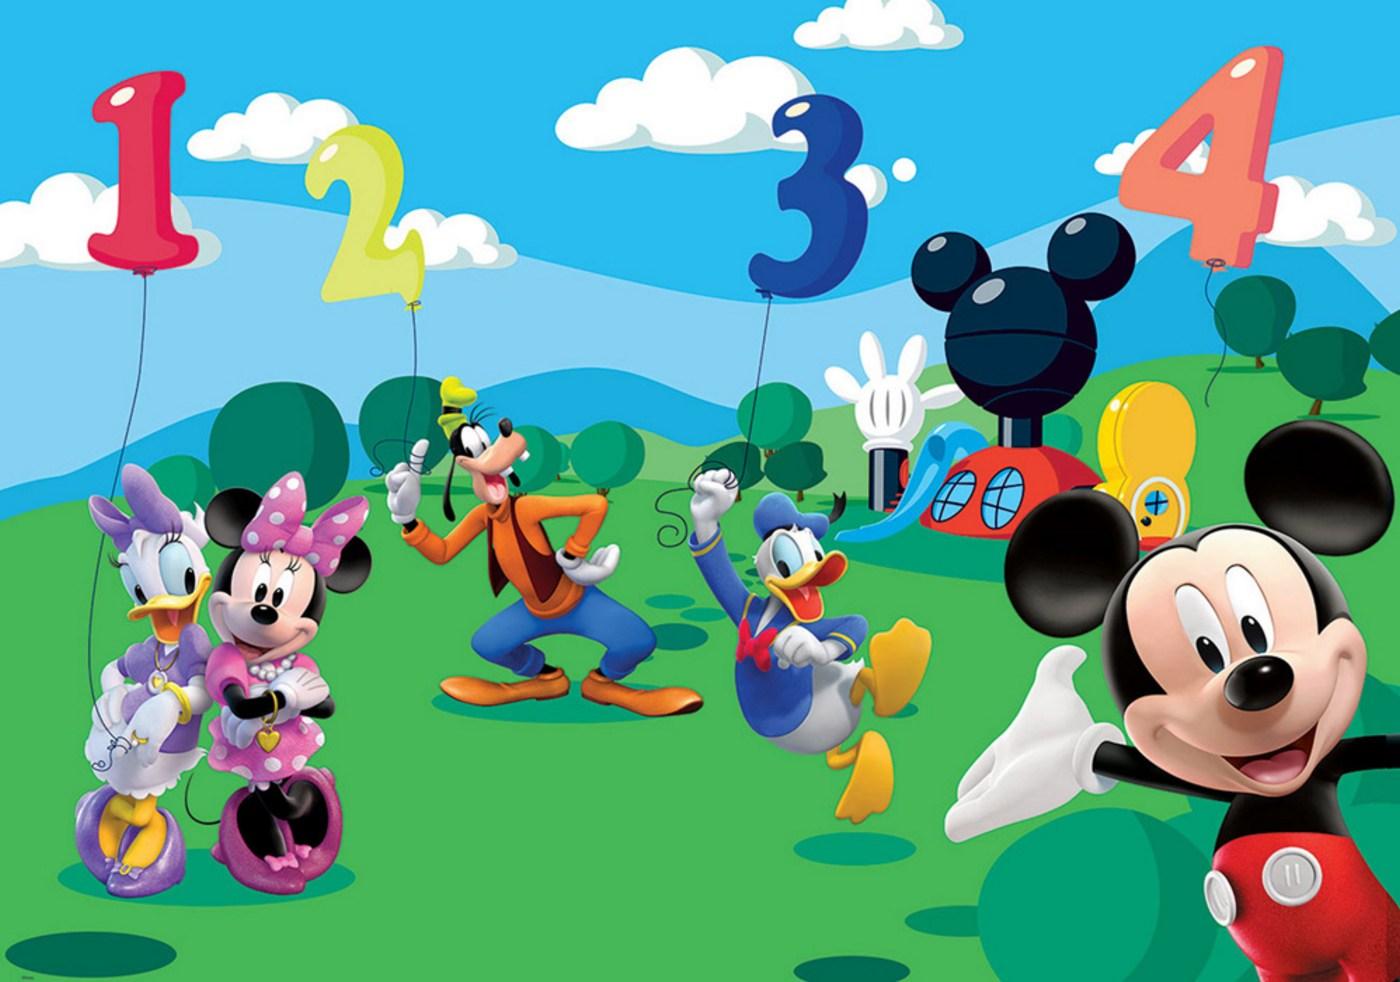 KiSS!, Fototapeten zu besten Preisen. - Fototapete no. 997 - Disney ...